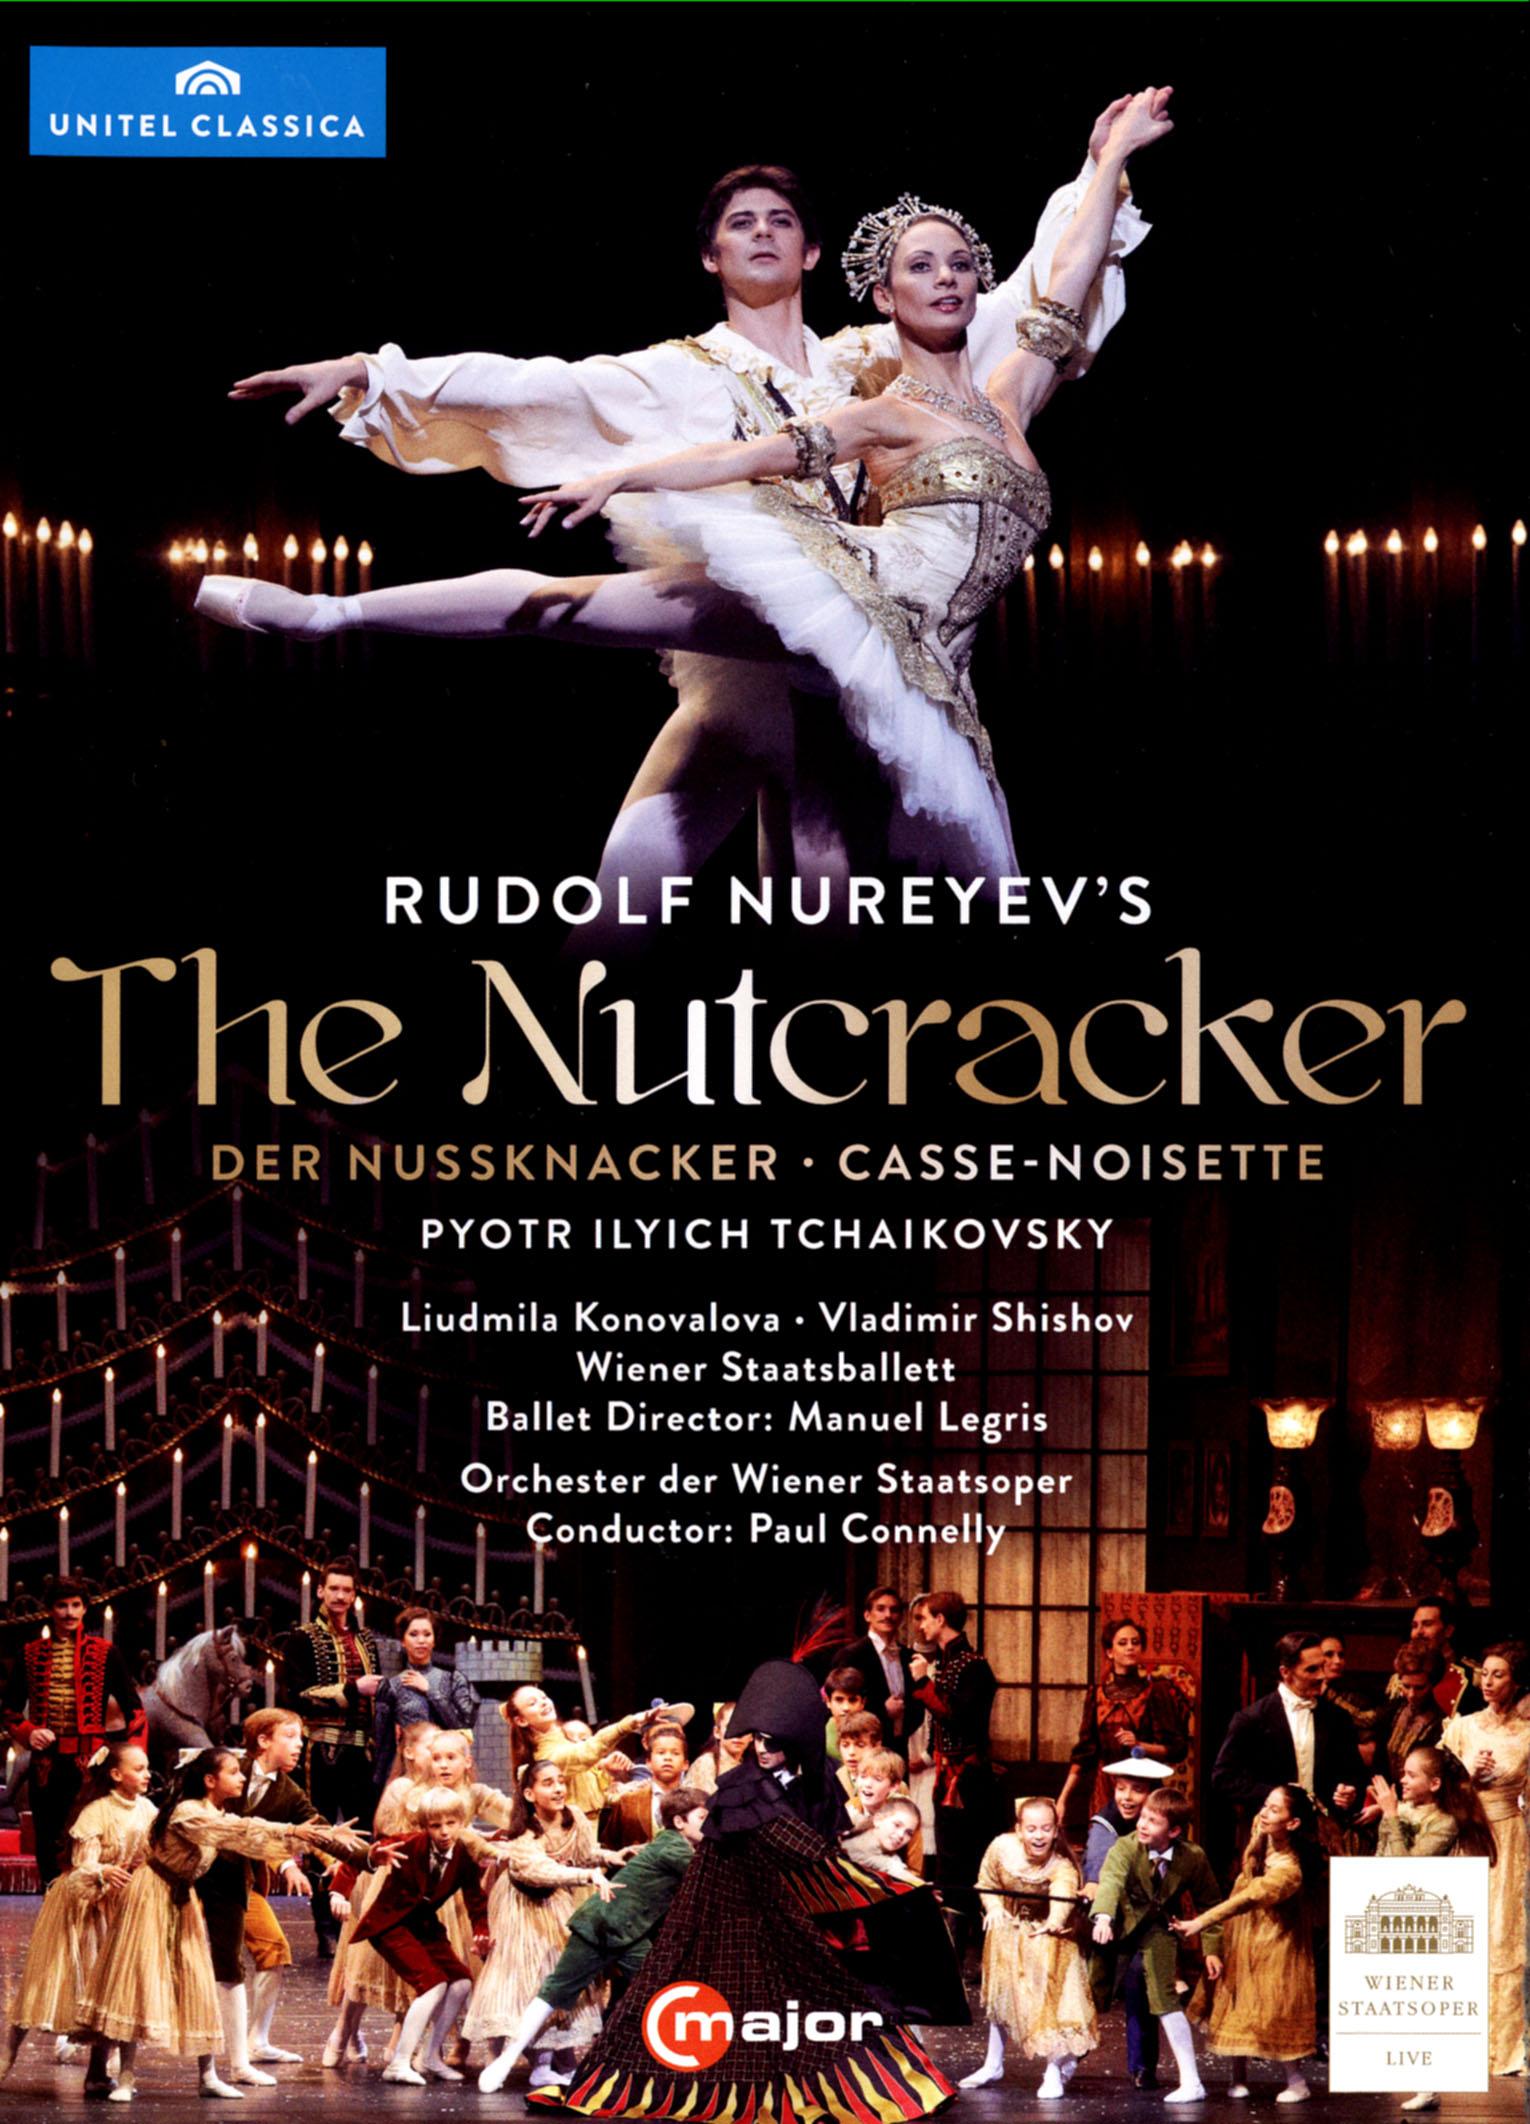 Nutcracker (Wiener Staatsballett) (2013)